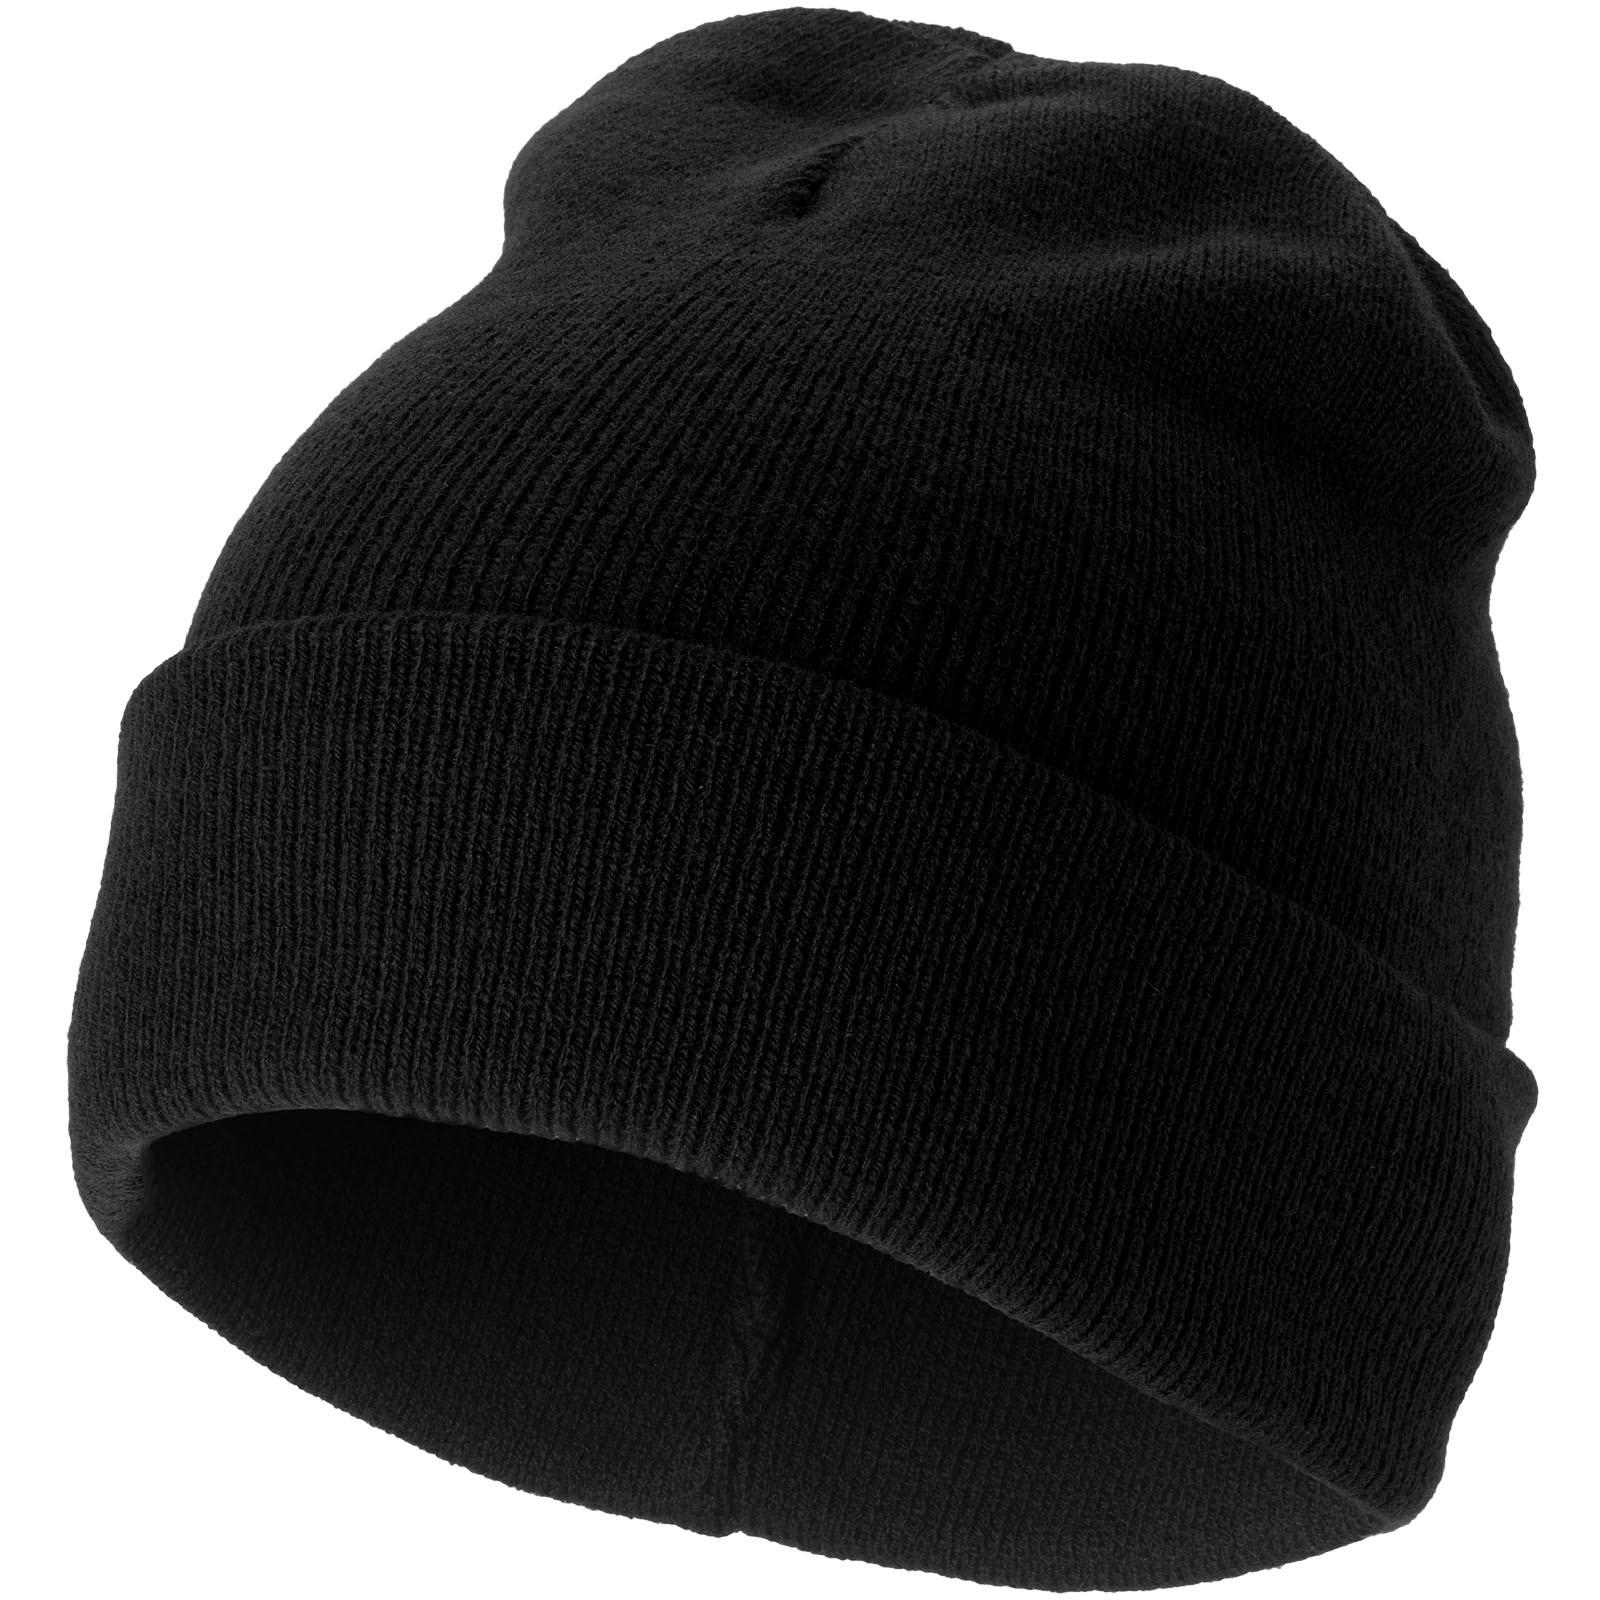 Irwin beanie - Solid black